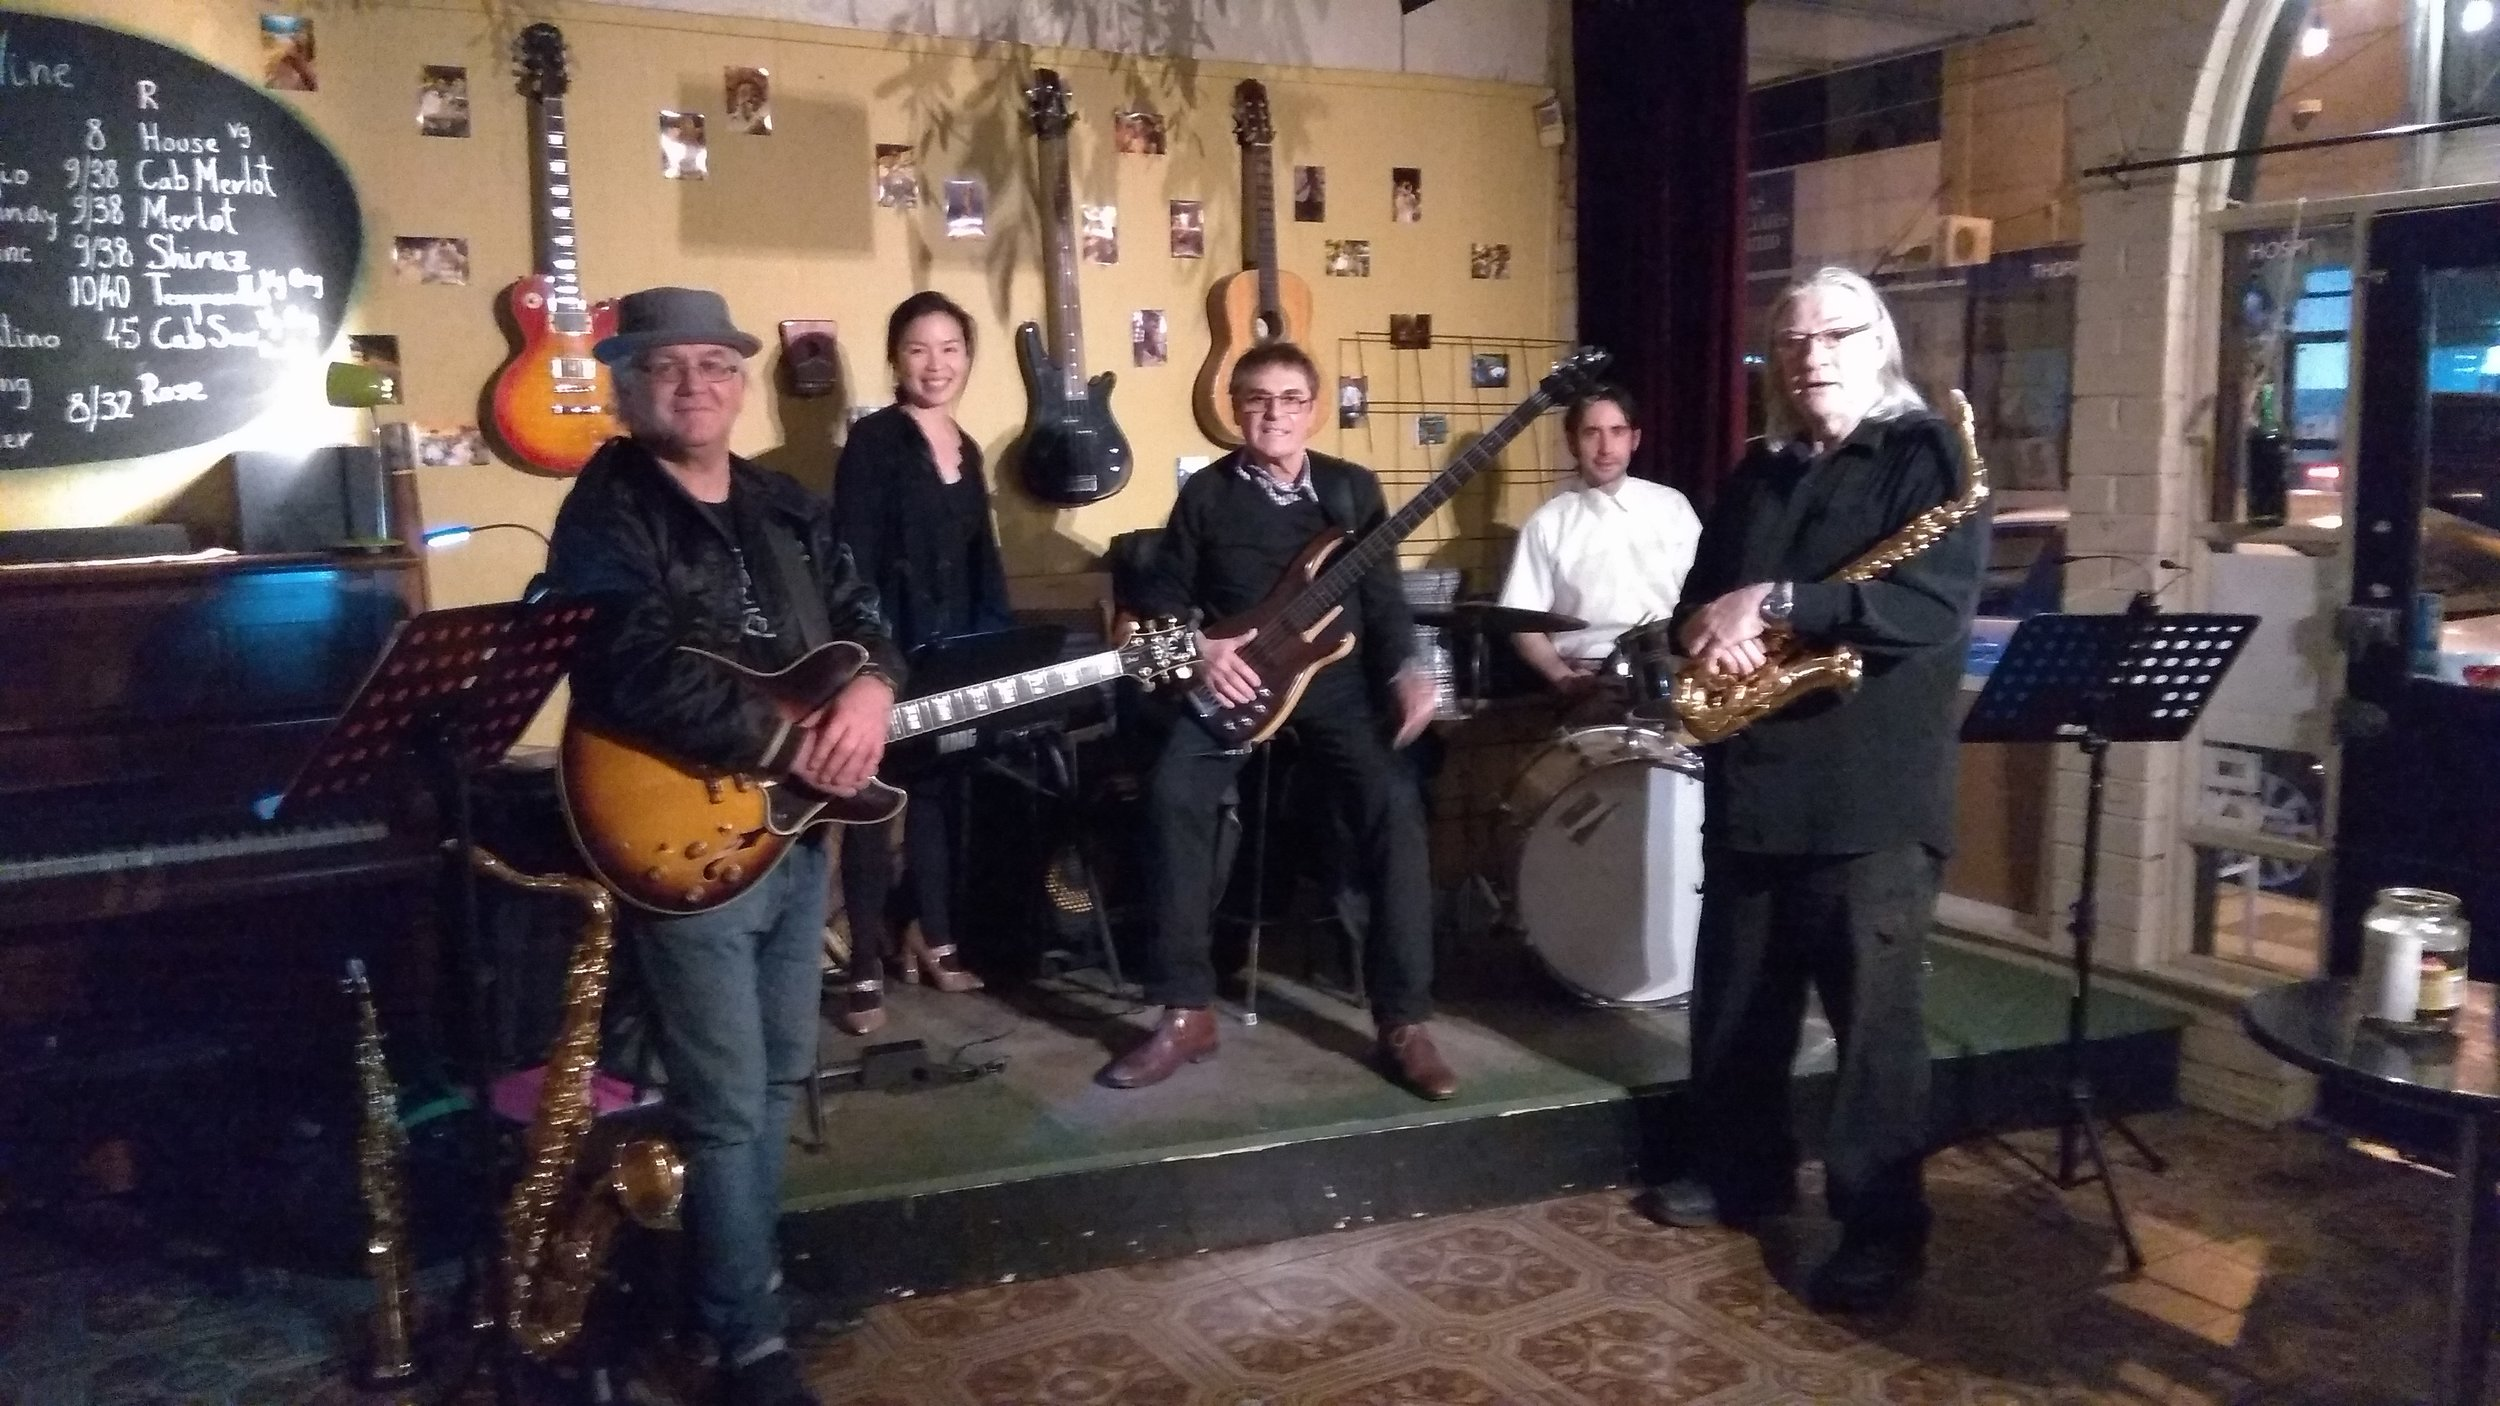 Neil, Kay, Ivan, Andre, Jeff (L-R)